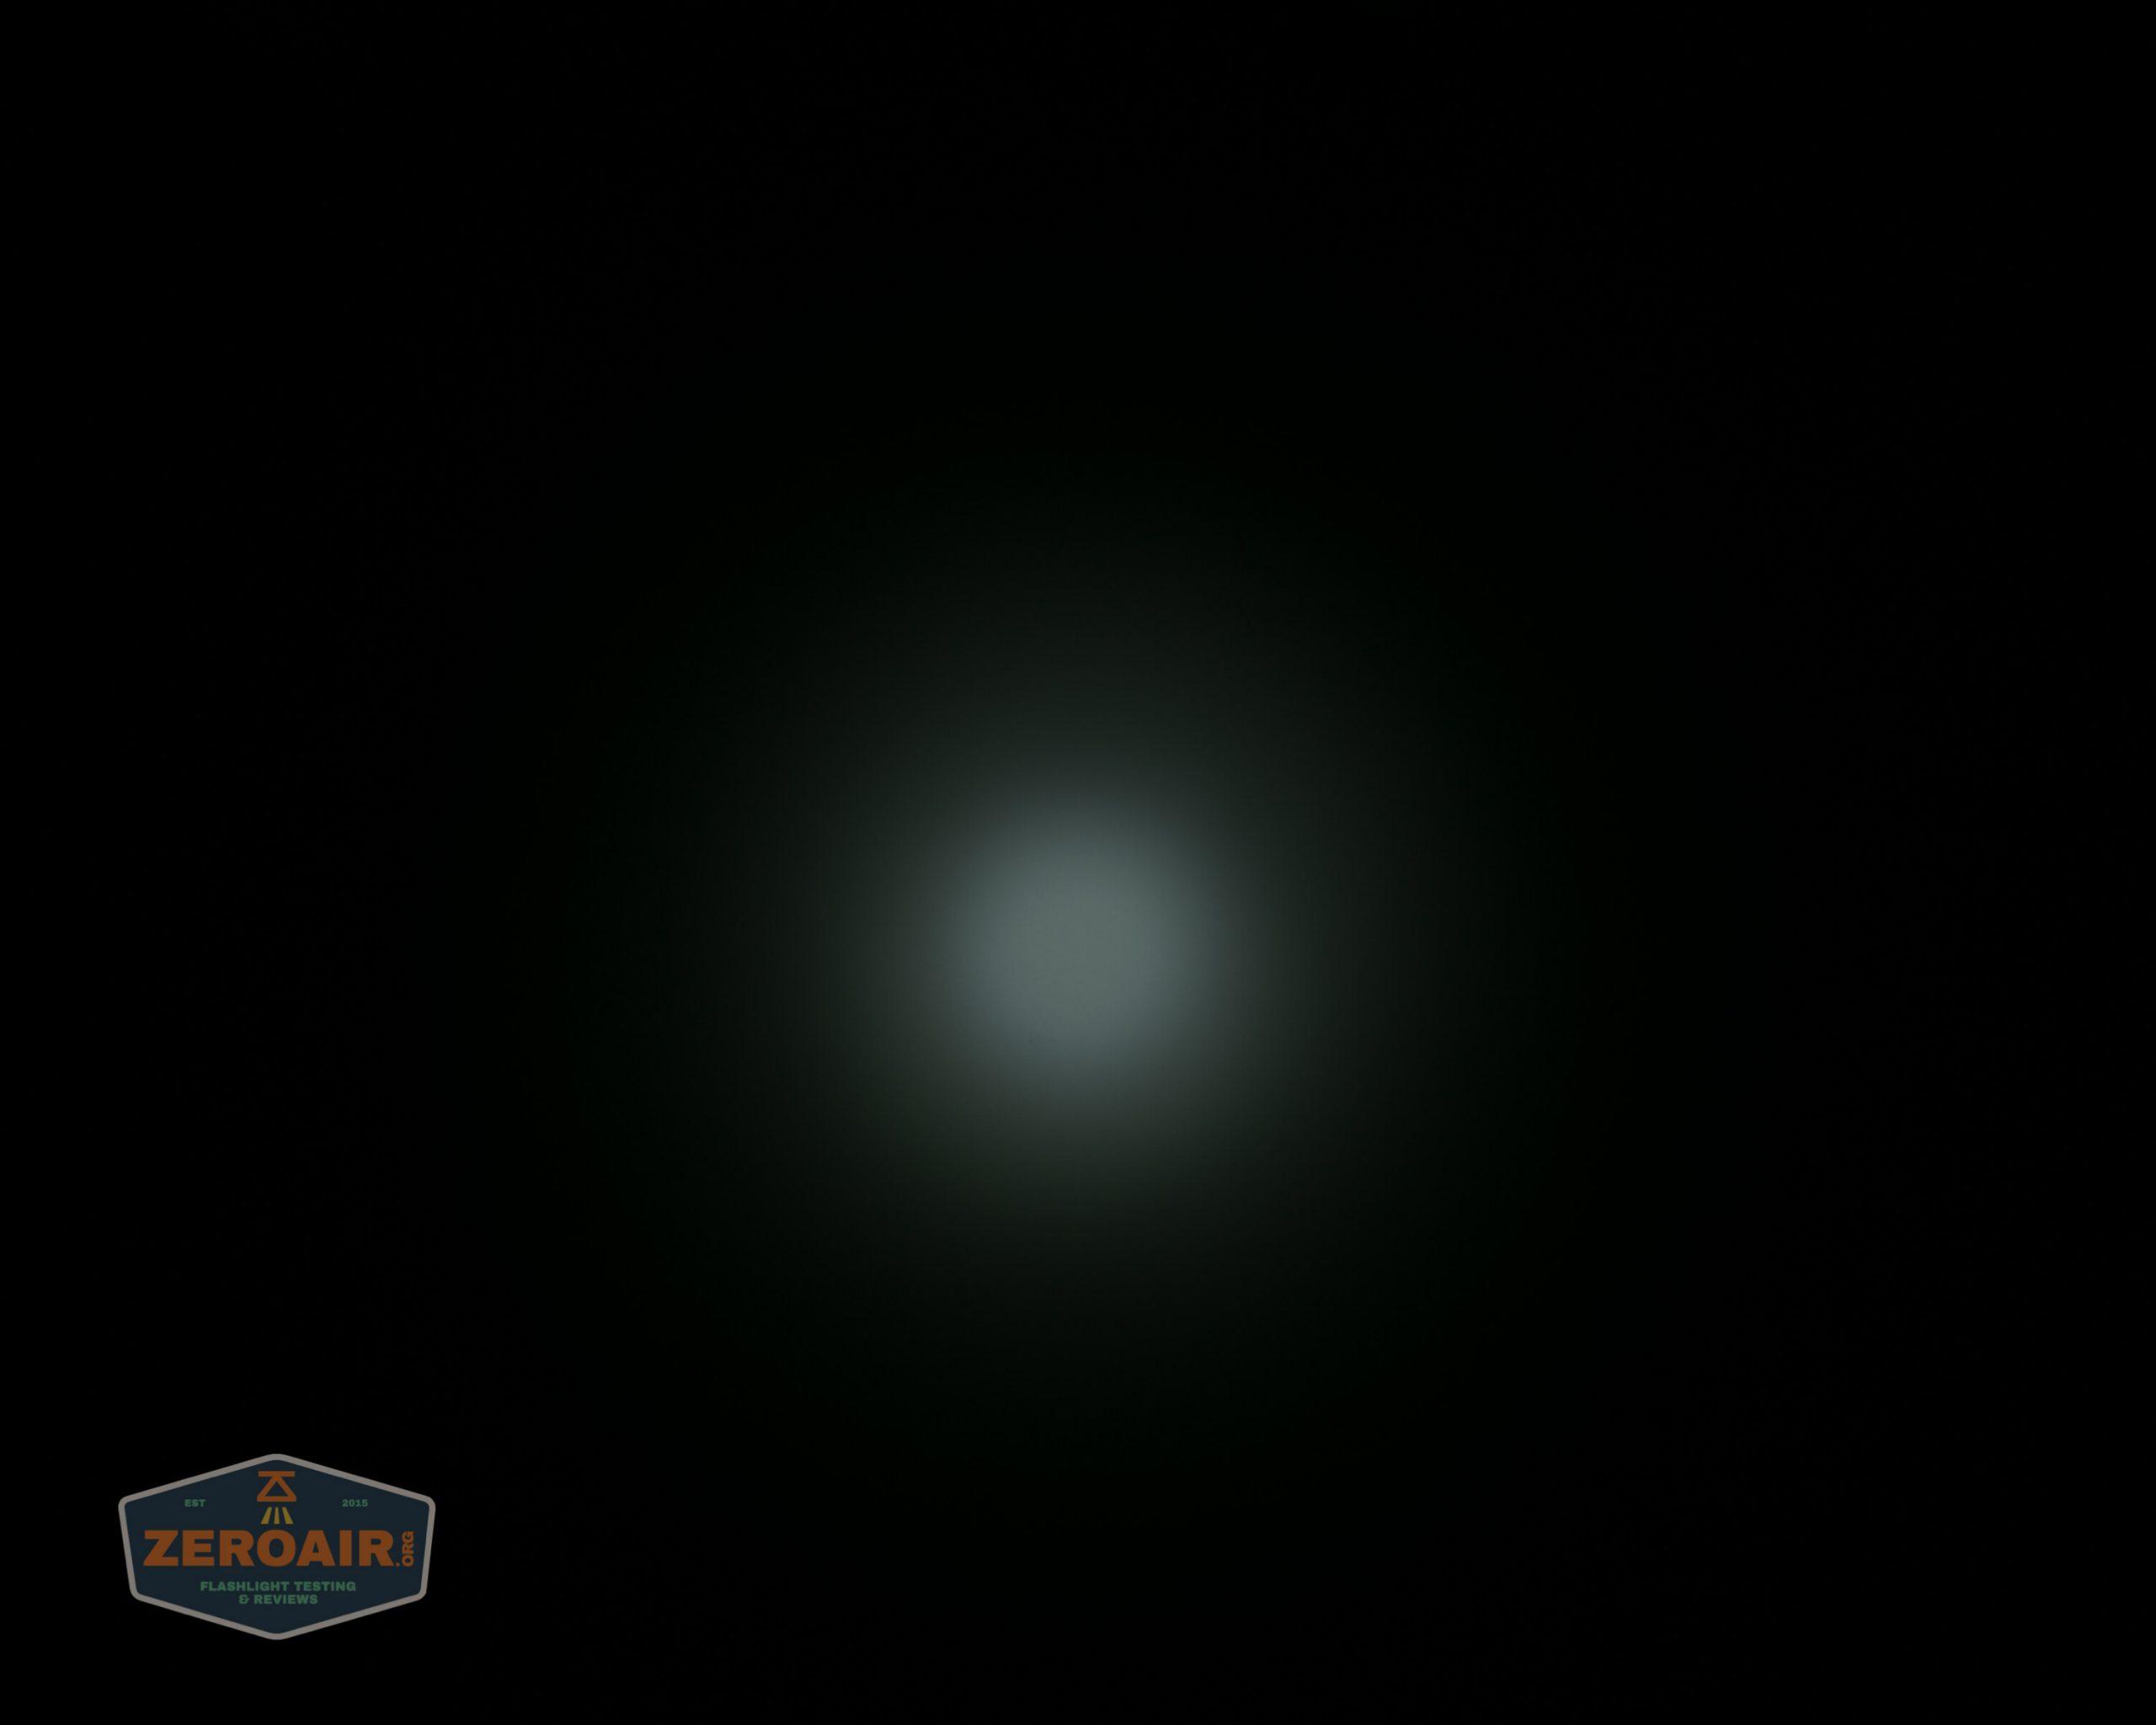 fireflylite e01 luminus sst-40 21700 beamshot ceiling 2